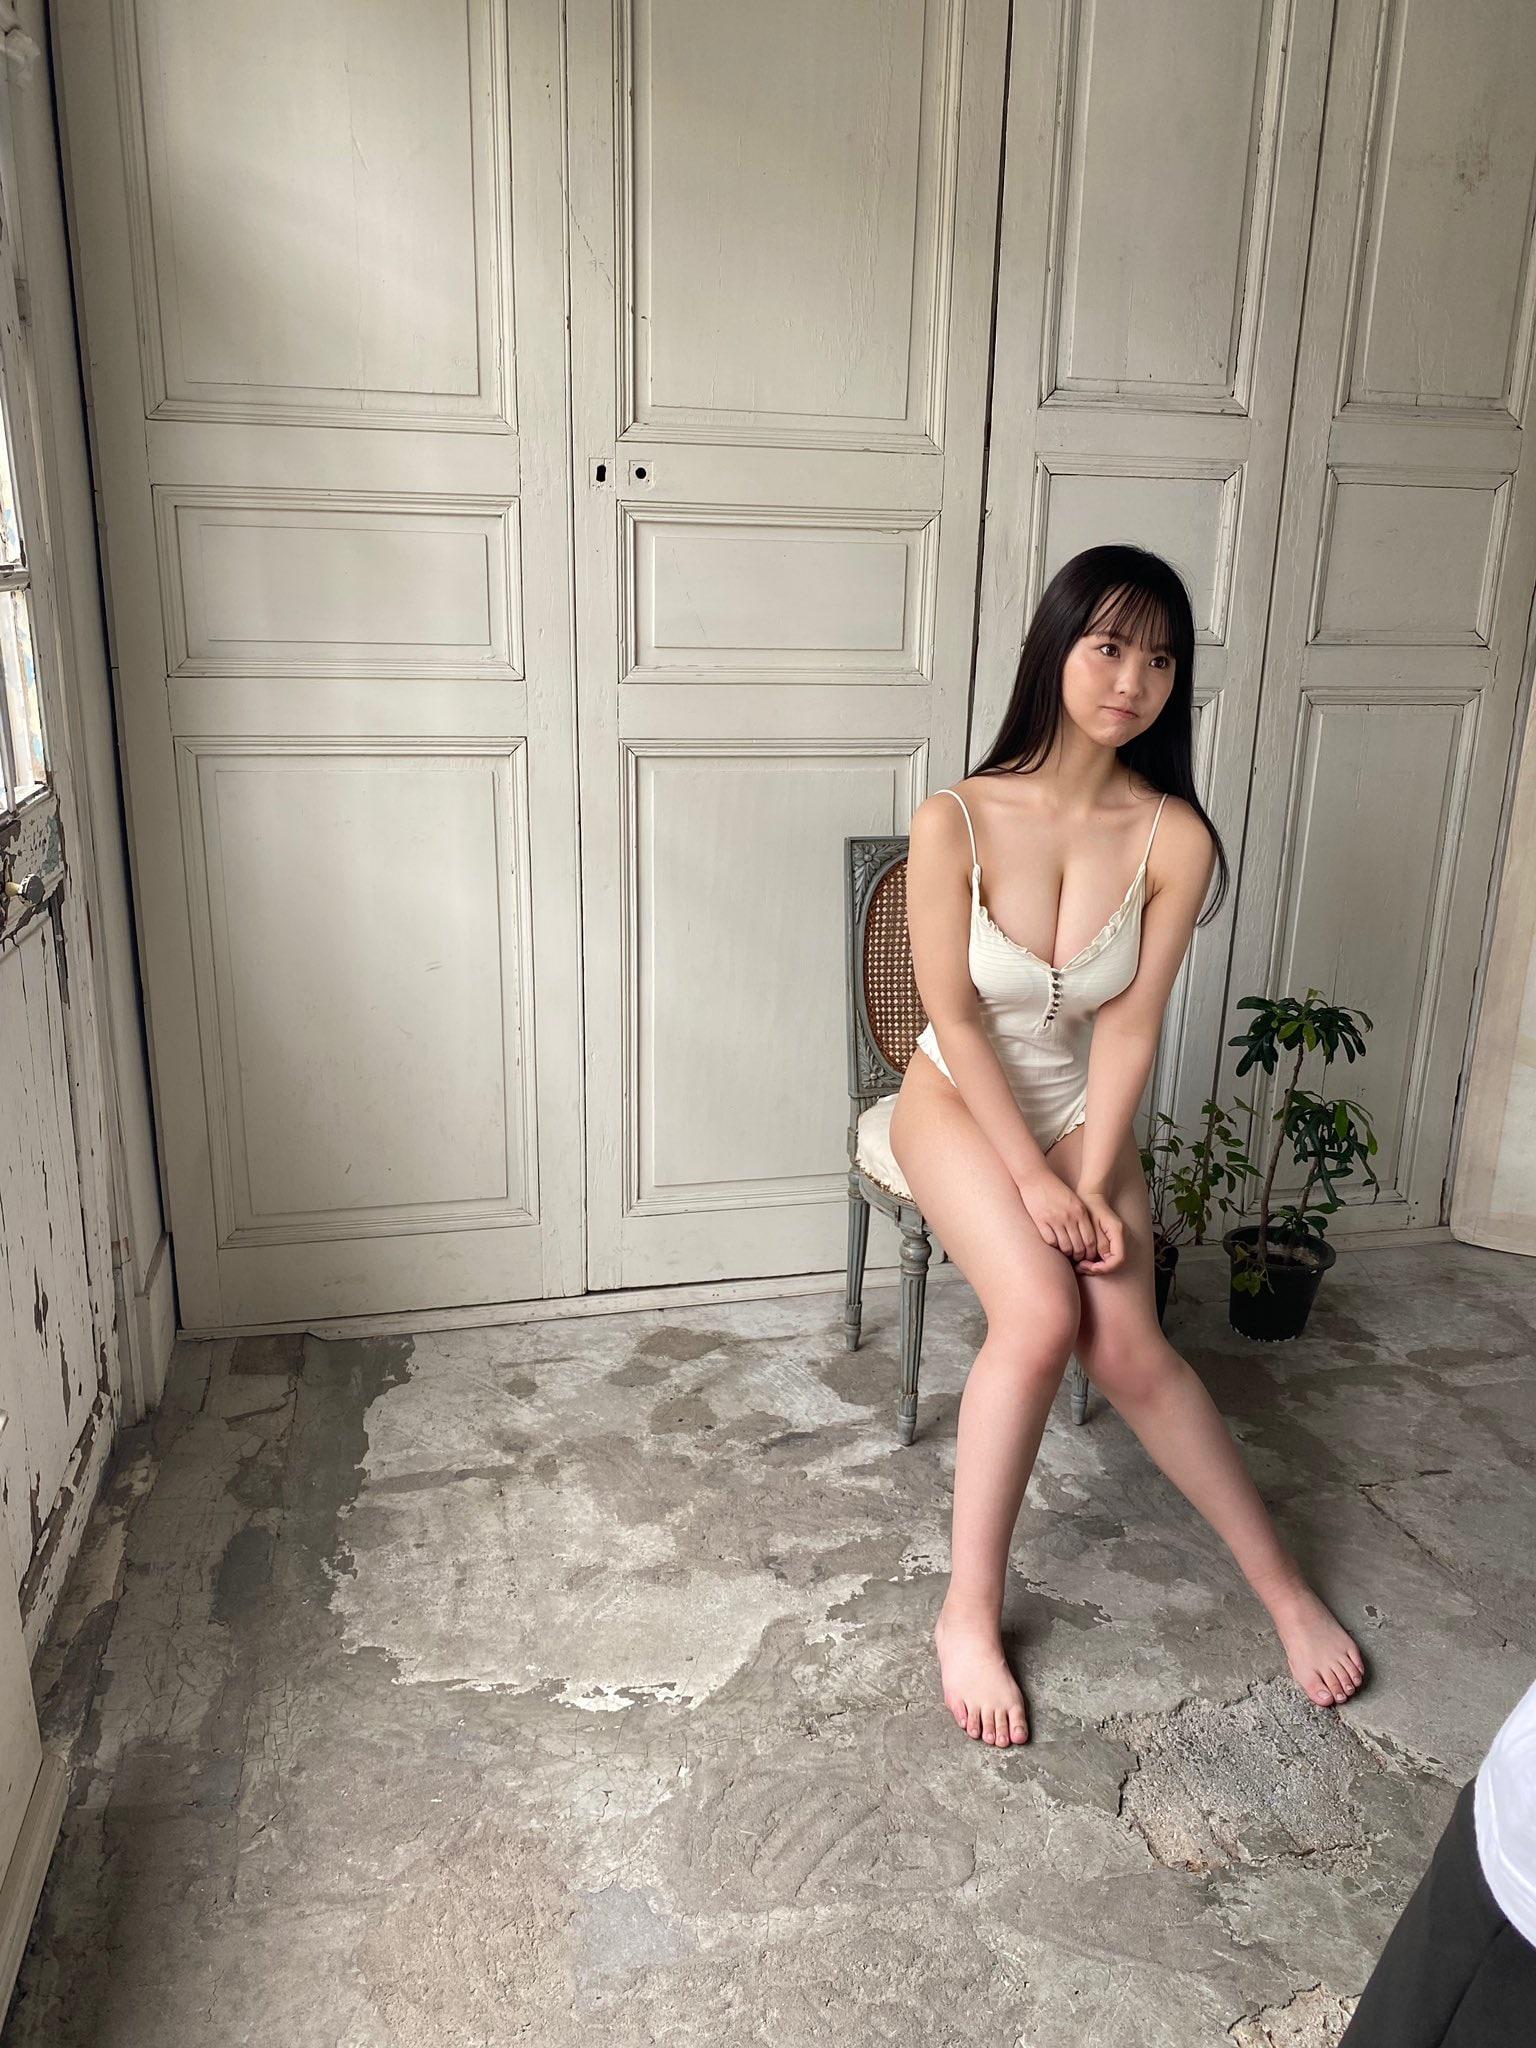 "NMB48本郷柚巴""オトナなキャミソール姿にドキっ""グラビア撮影のオフショットを公開【画像2枚】の画像002"